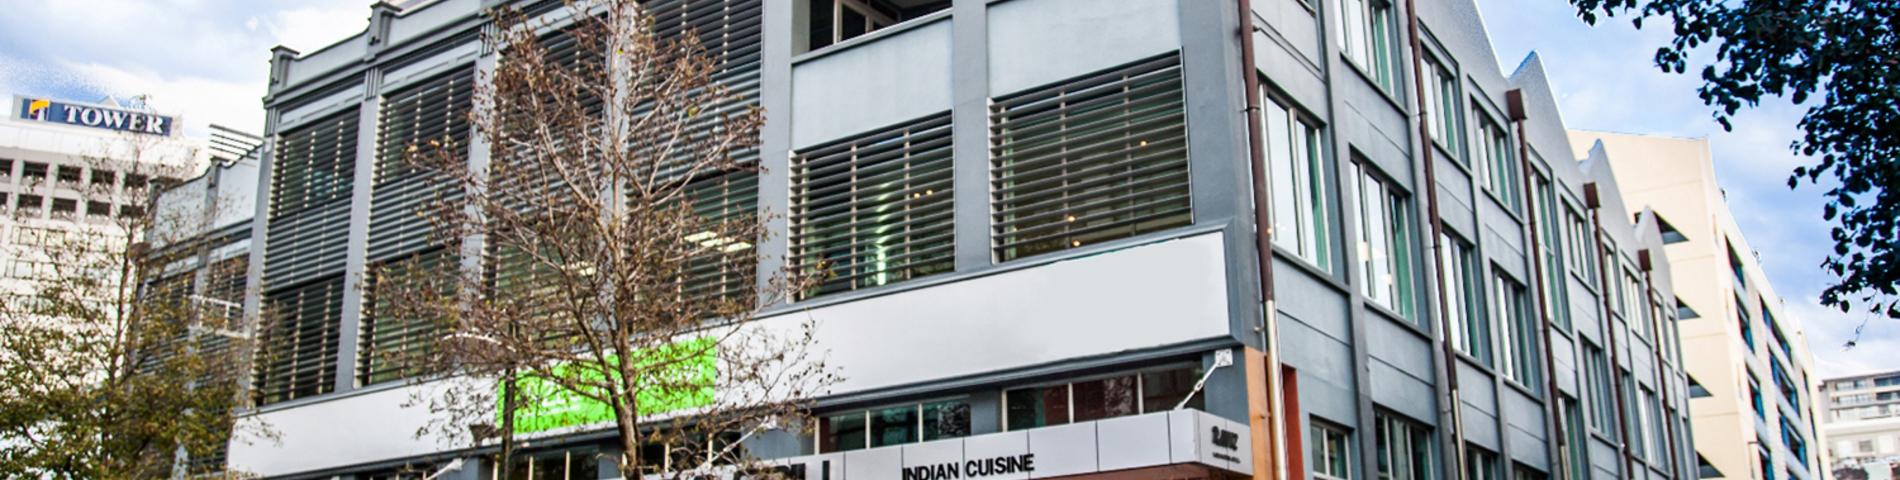 NZLC New Zealand Language Centres picture 1